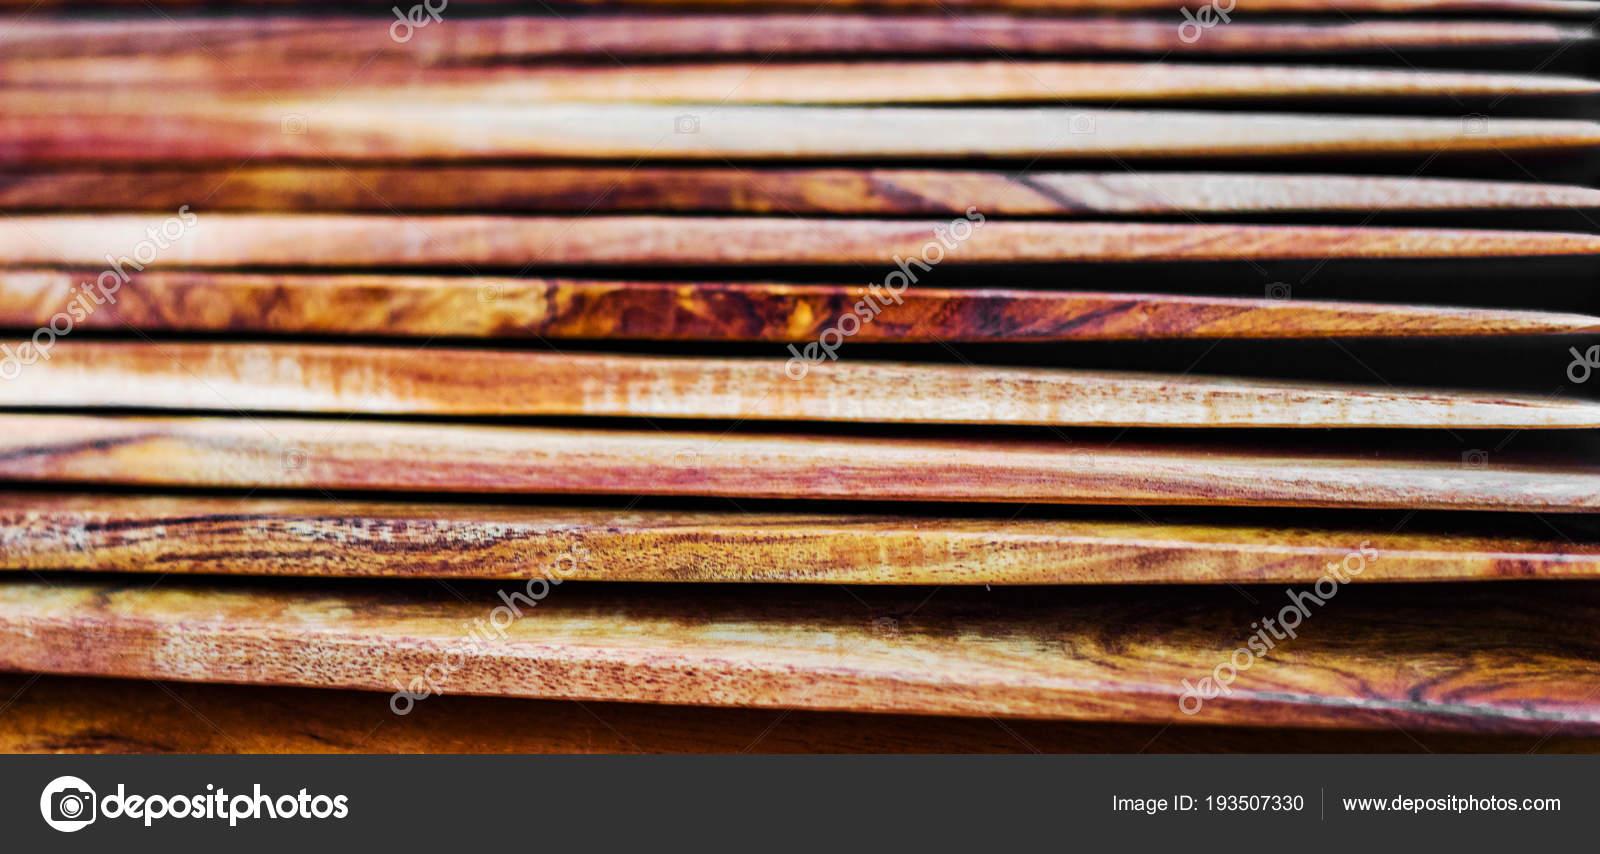 Vertical Parallel Wooden Planks Background Texture For Wallpaperportrait Orientation Stock Photo